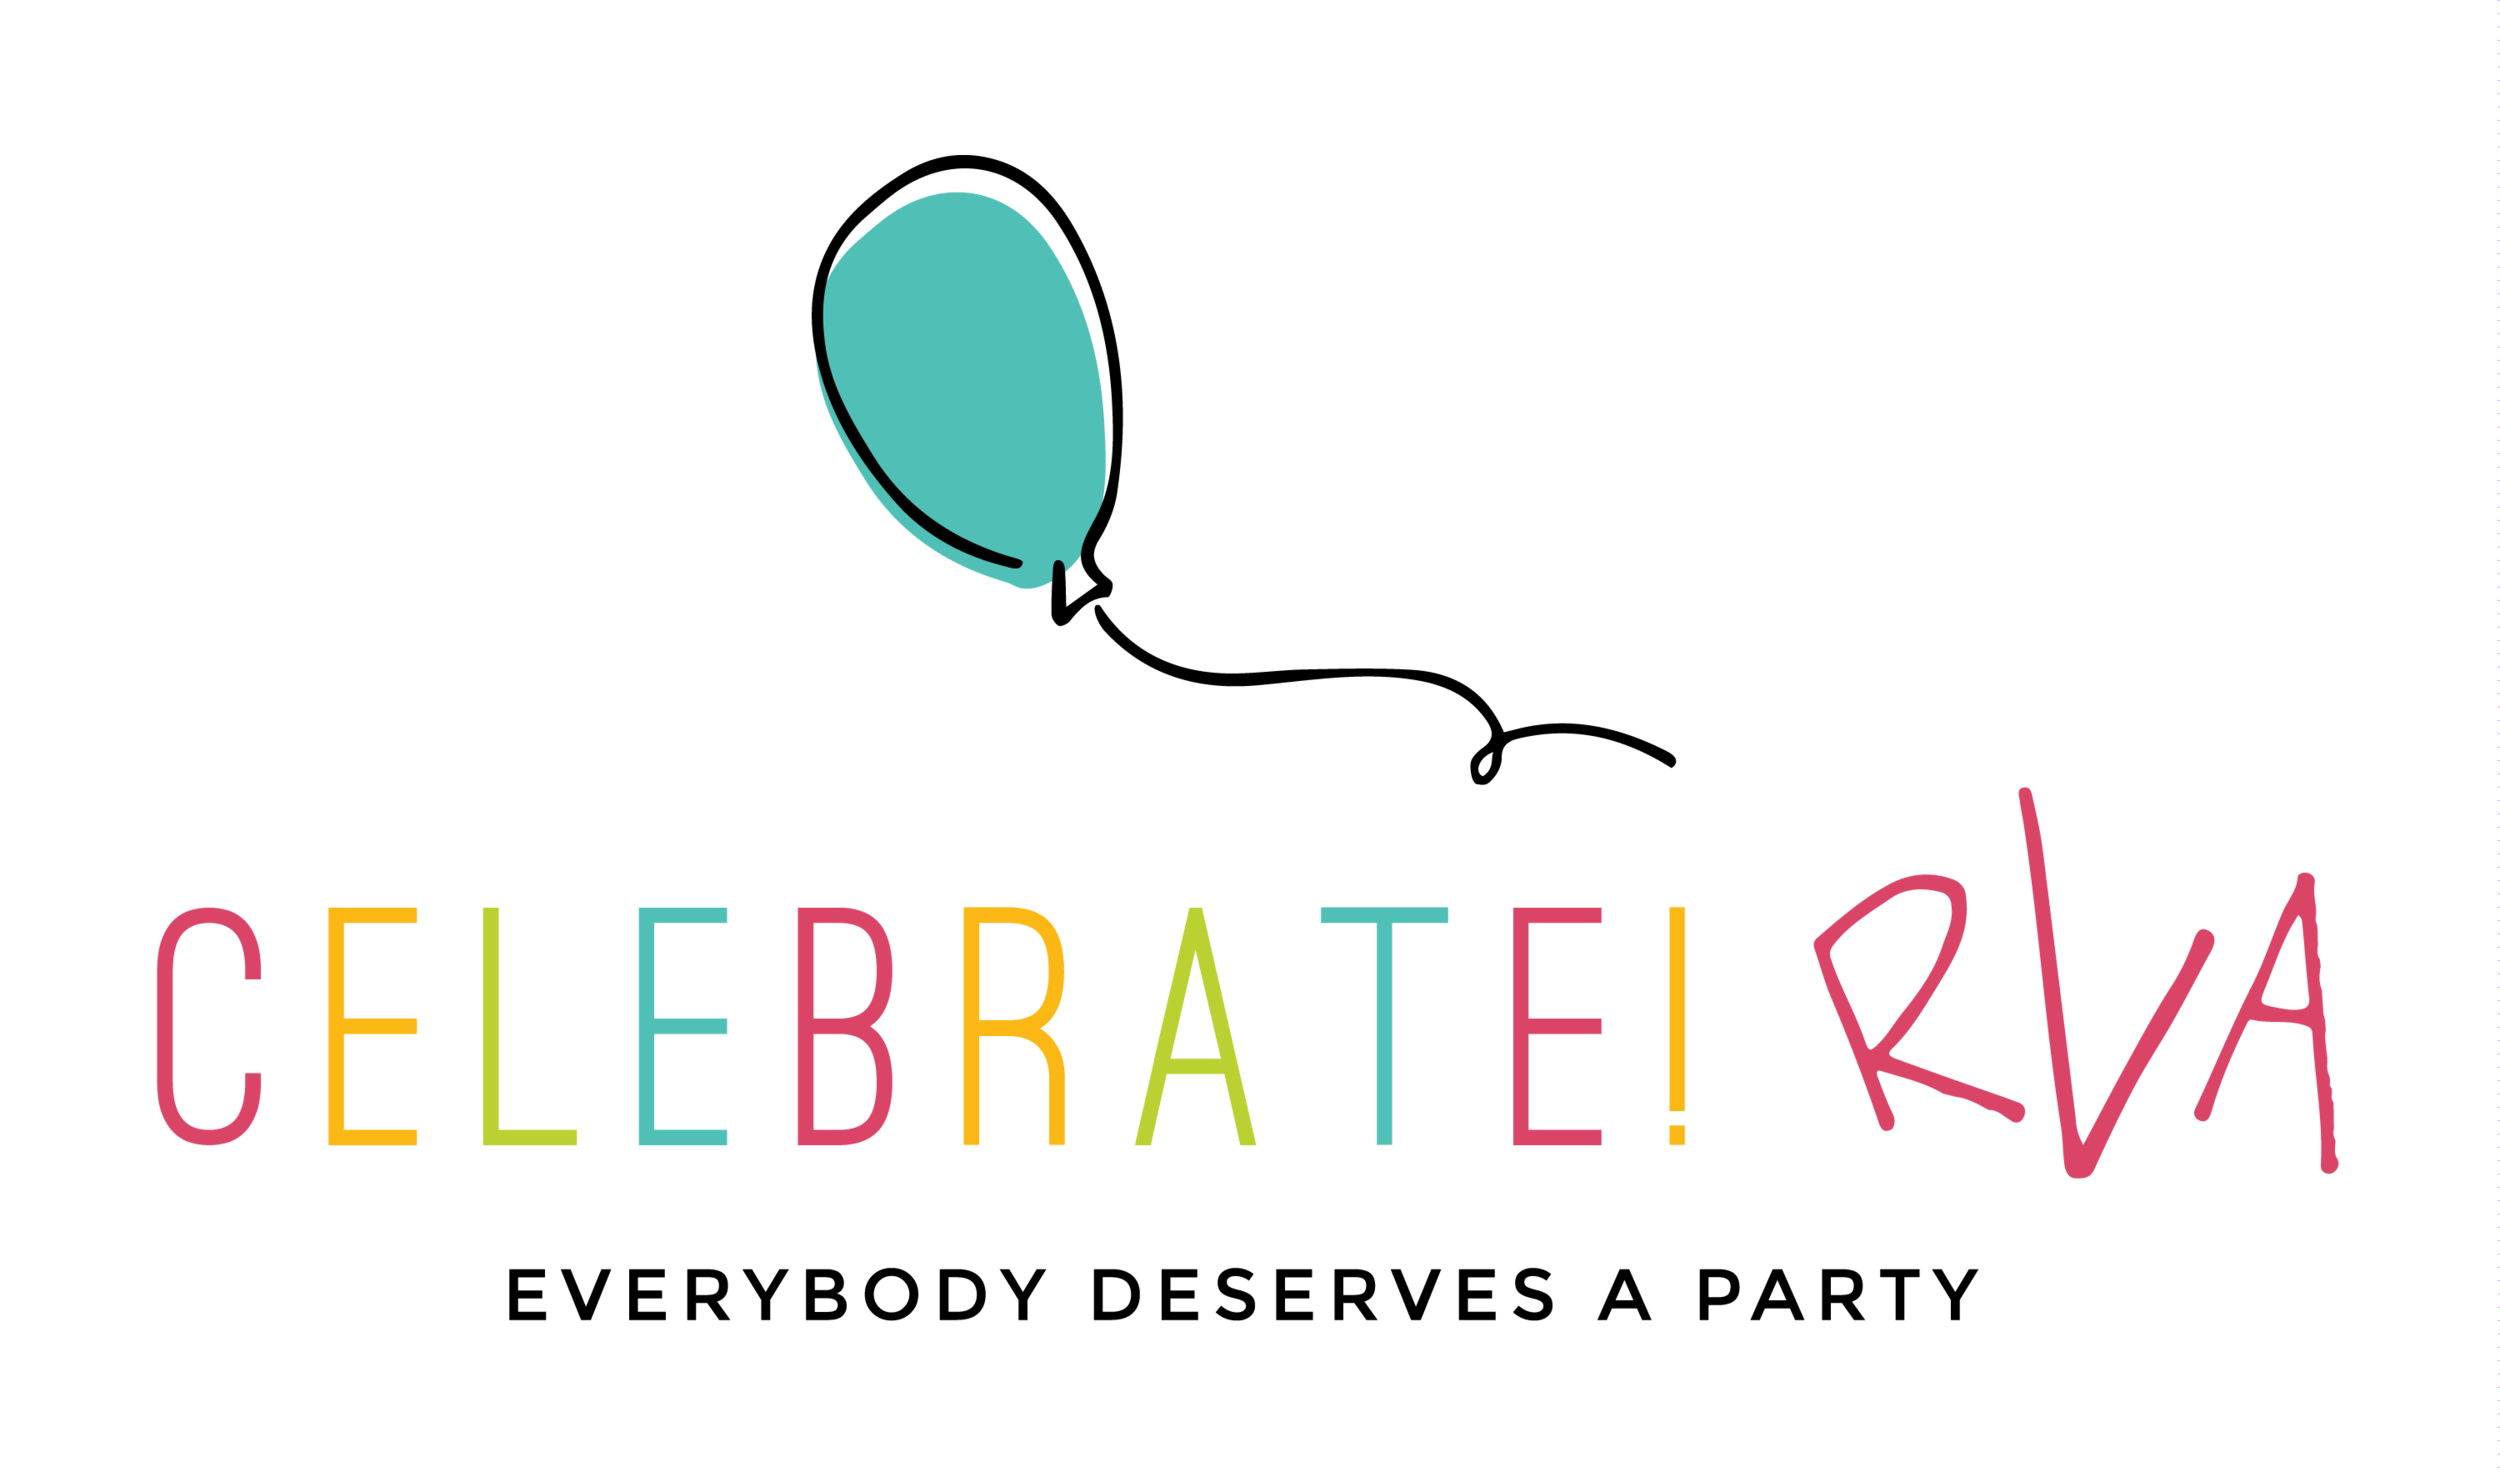 Celebrate-RVA-Alt-Logo-Large.png